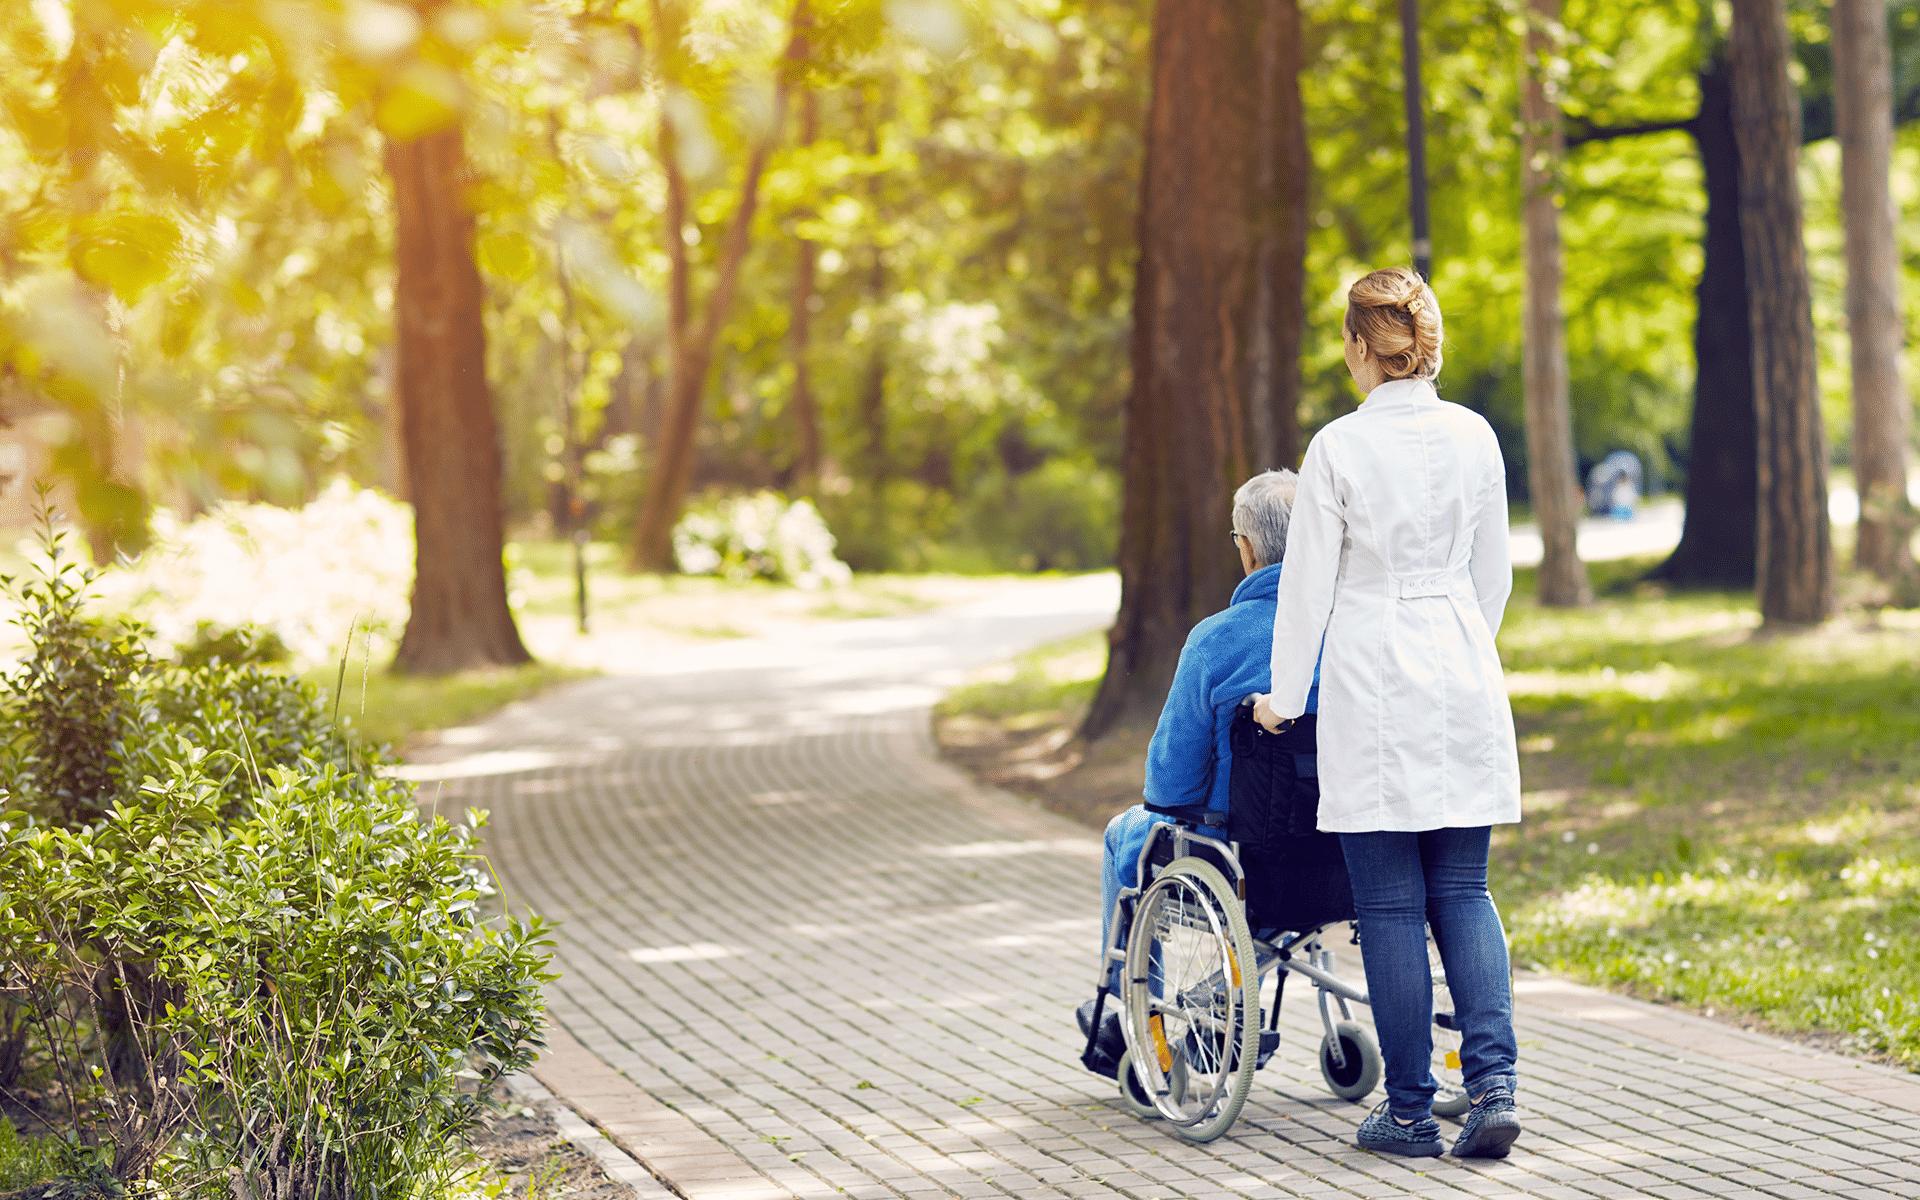 A hospice nurse taking an elderly man on a walk in his wheelchair.